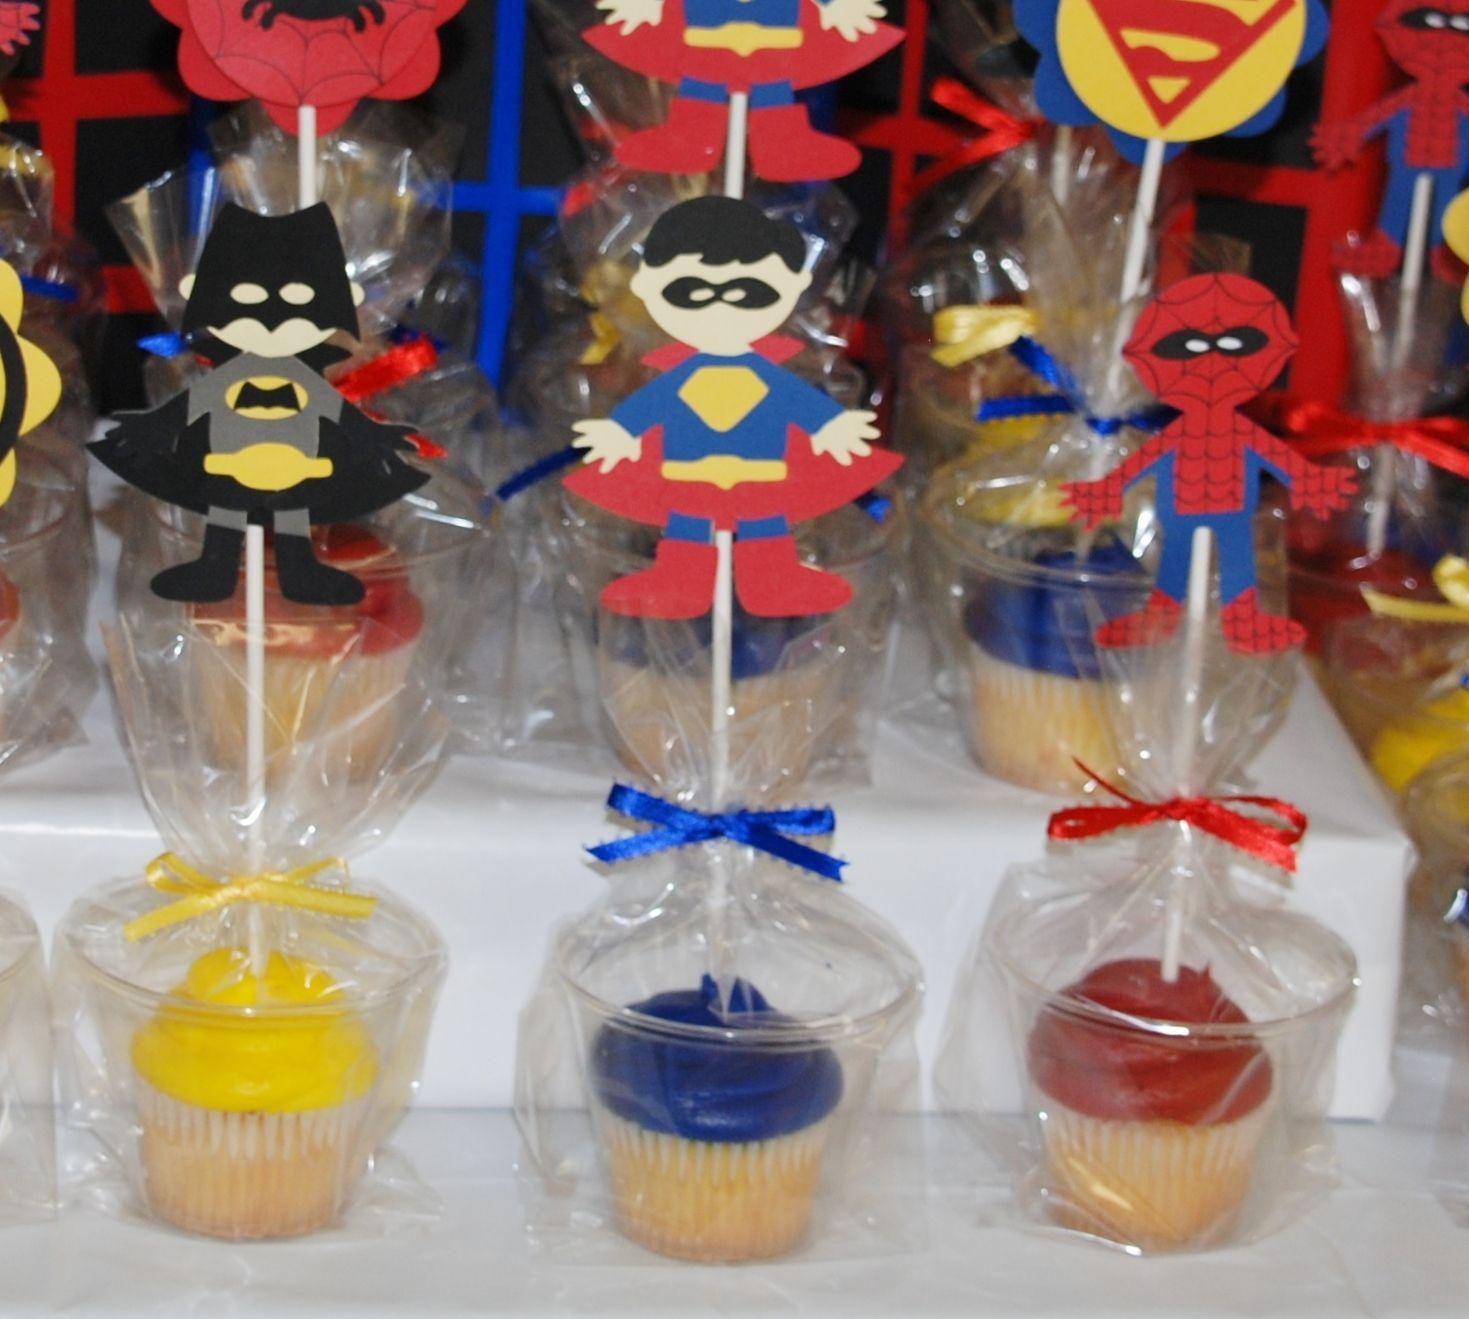 Superhero Baby Shower. Superhero Cupcakes In A Cup